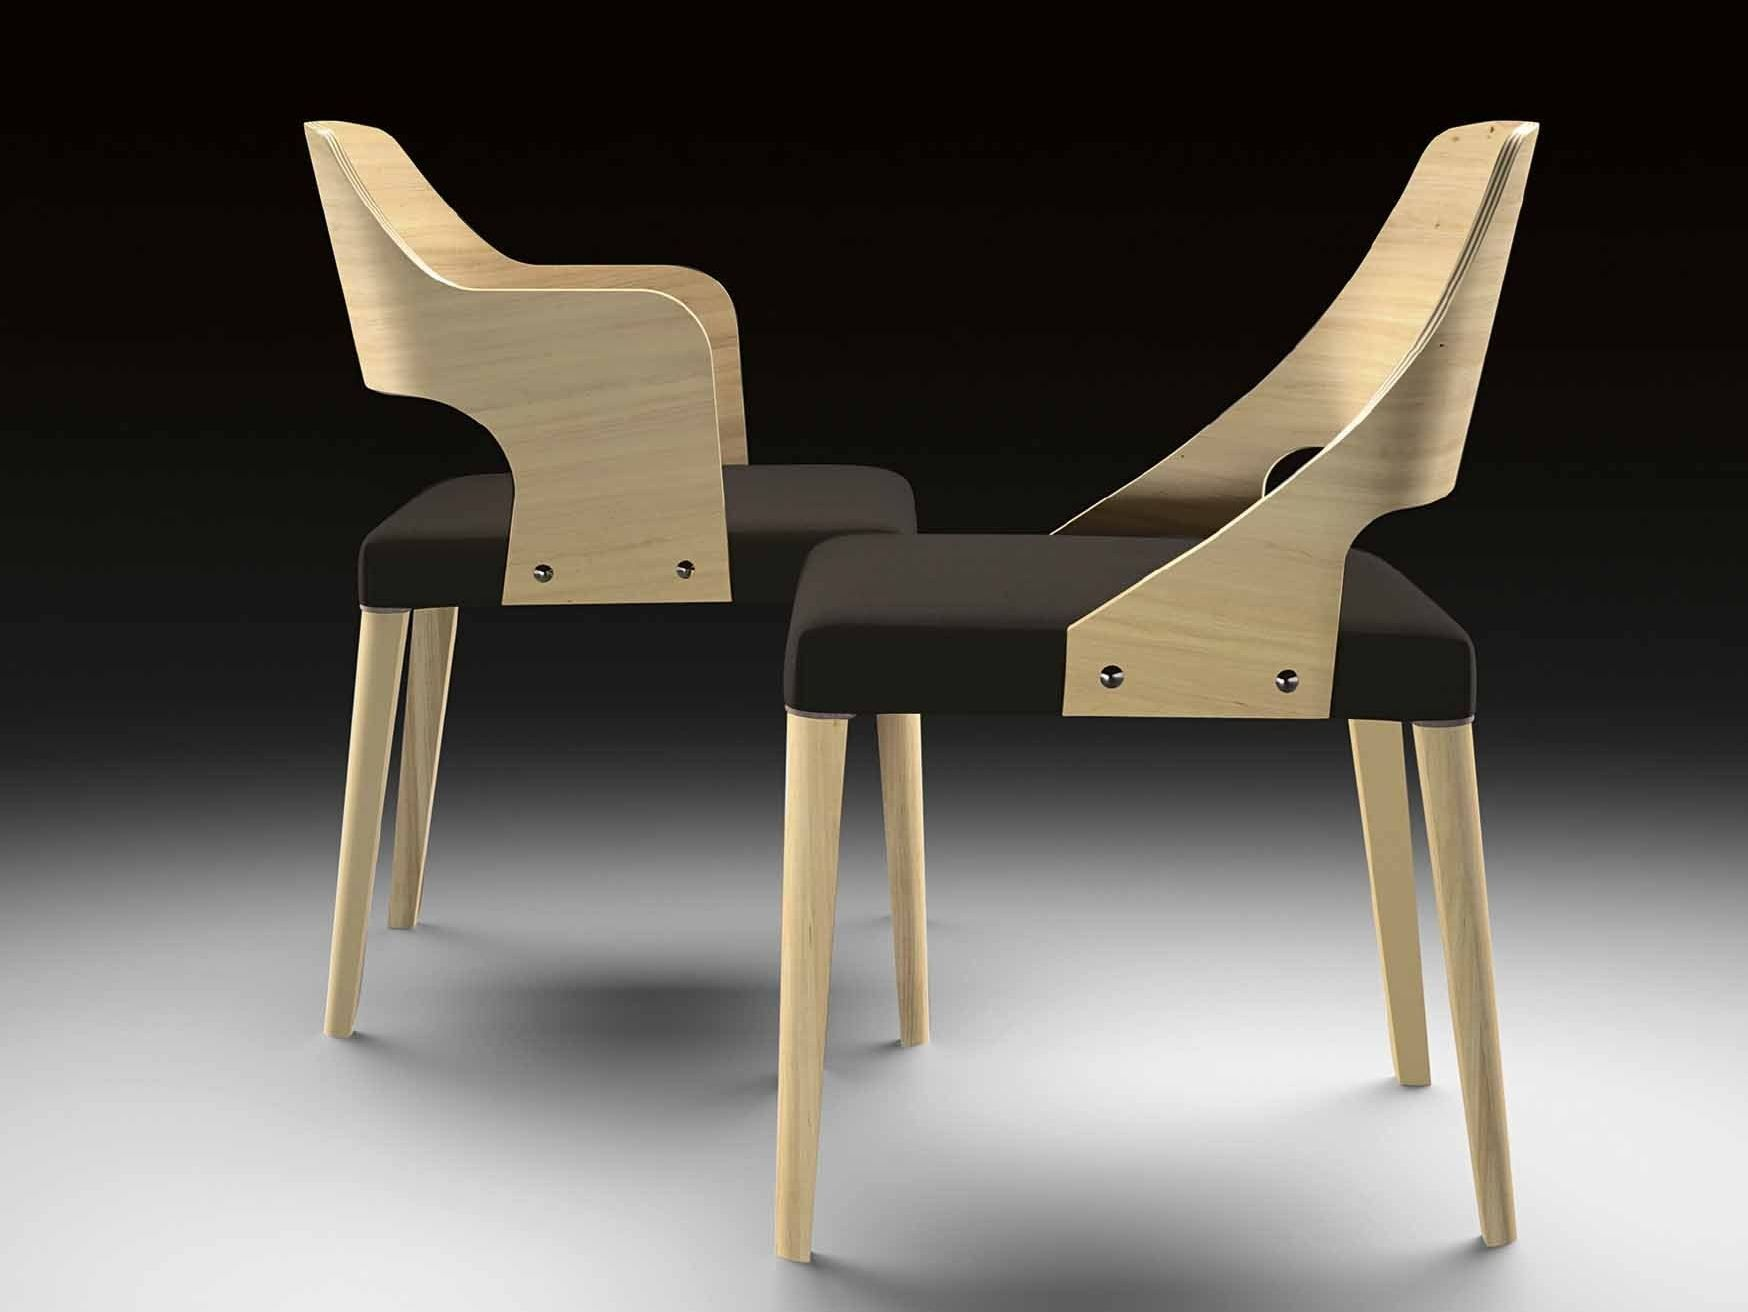 Metalmobil Sedie ~ Collezione sedie desig aqua metalmobil metalmobil